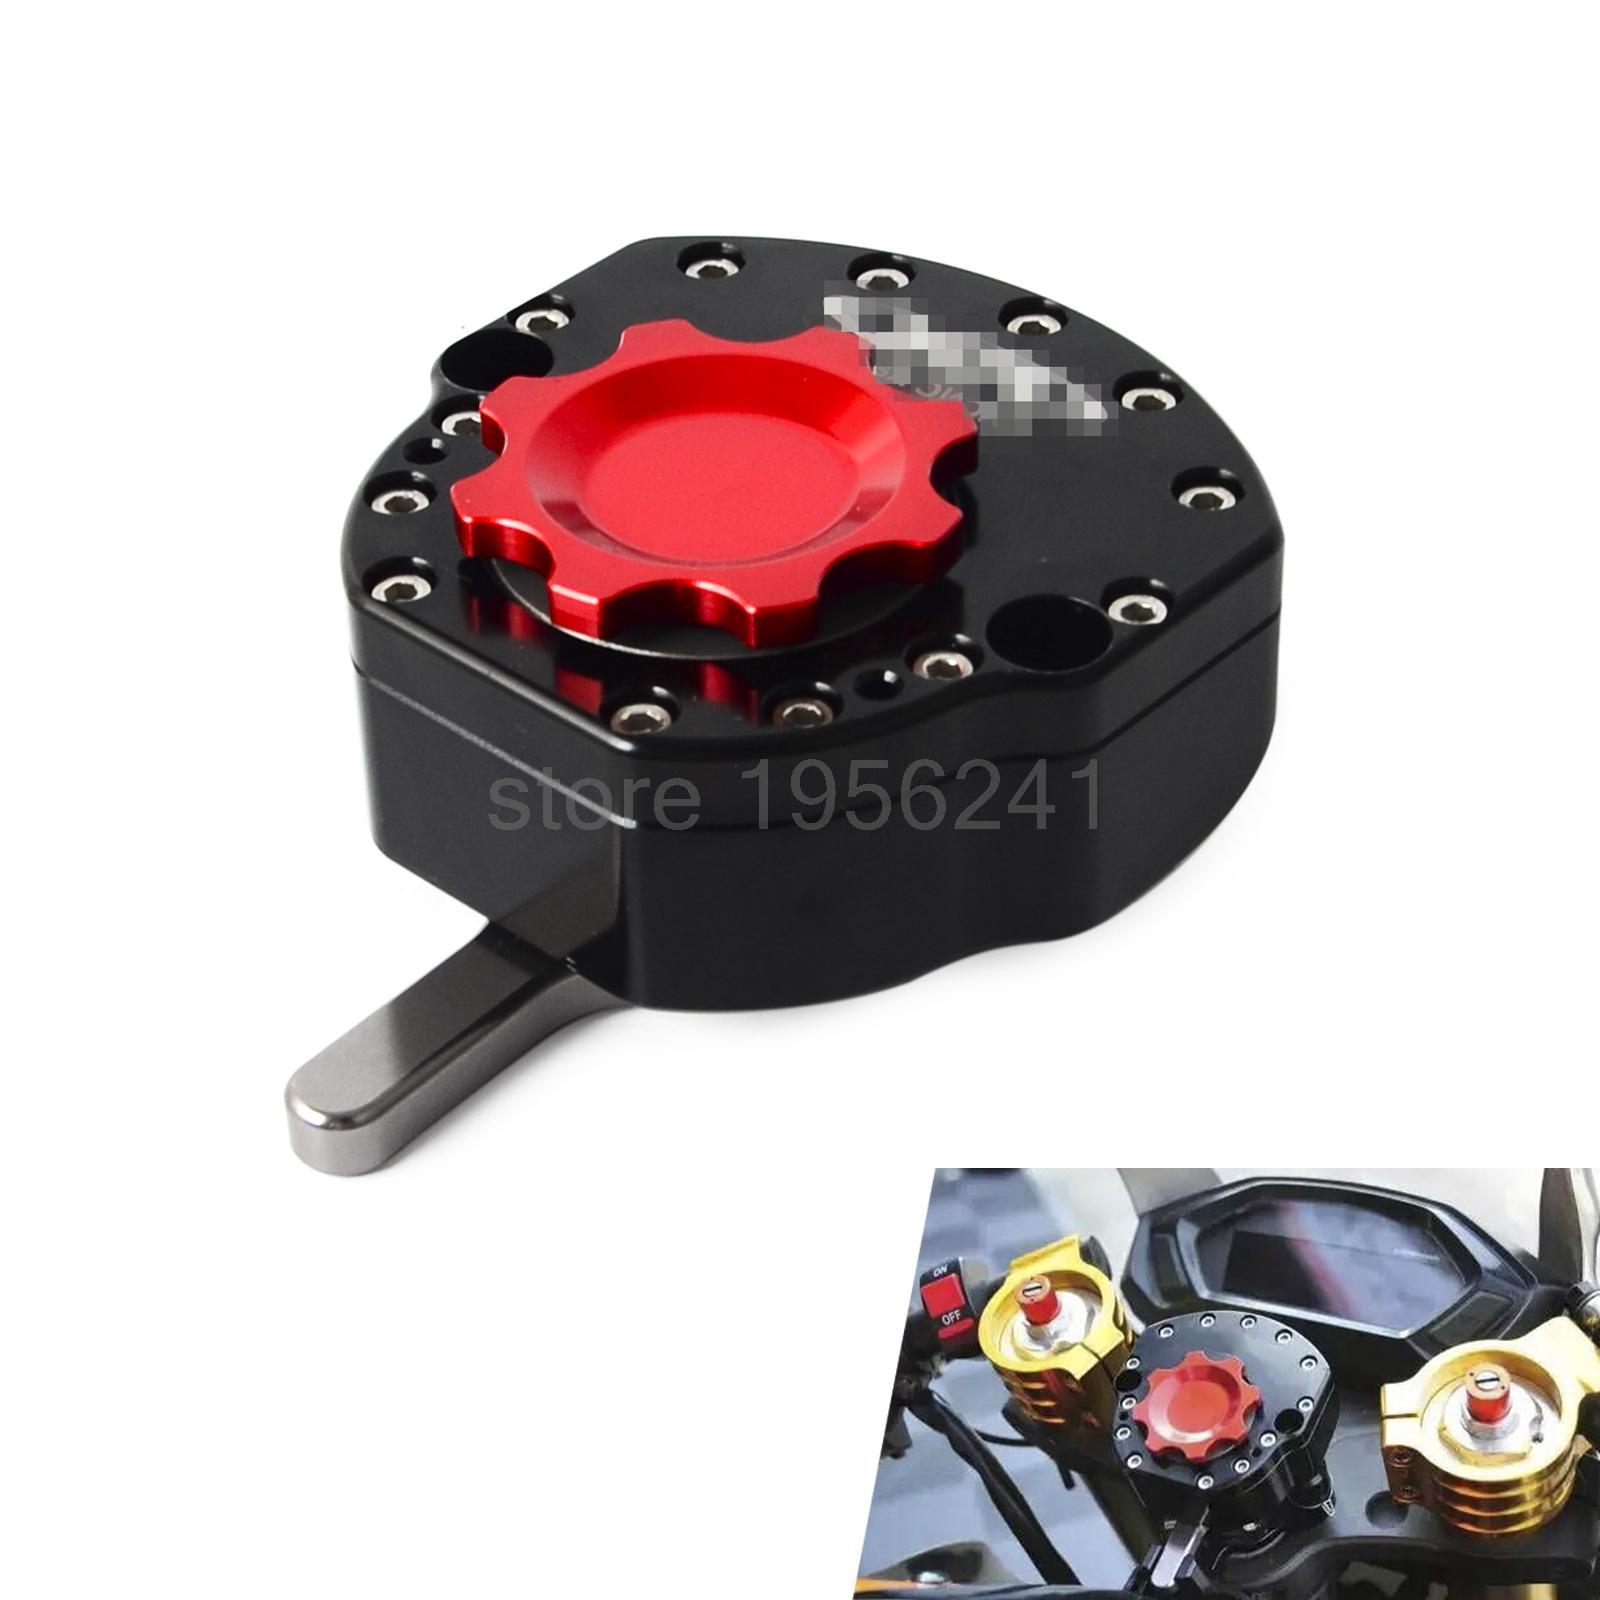 CNC Steering Stabilizer Damper For Kawasaki EX250R Ninja 08-12 EX300R 13-15 ZX636 13-14 ZX6R ZX-6R 07-12 ZX10R ZX-10R 04-13